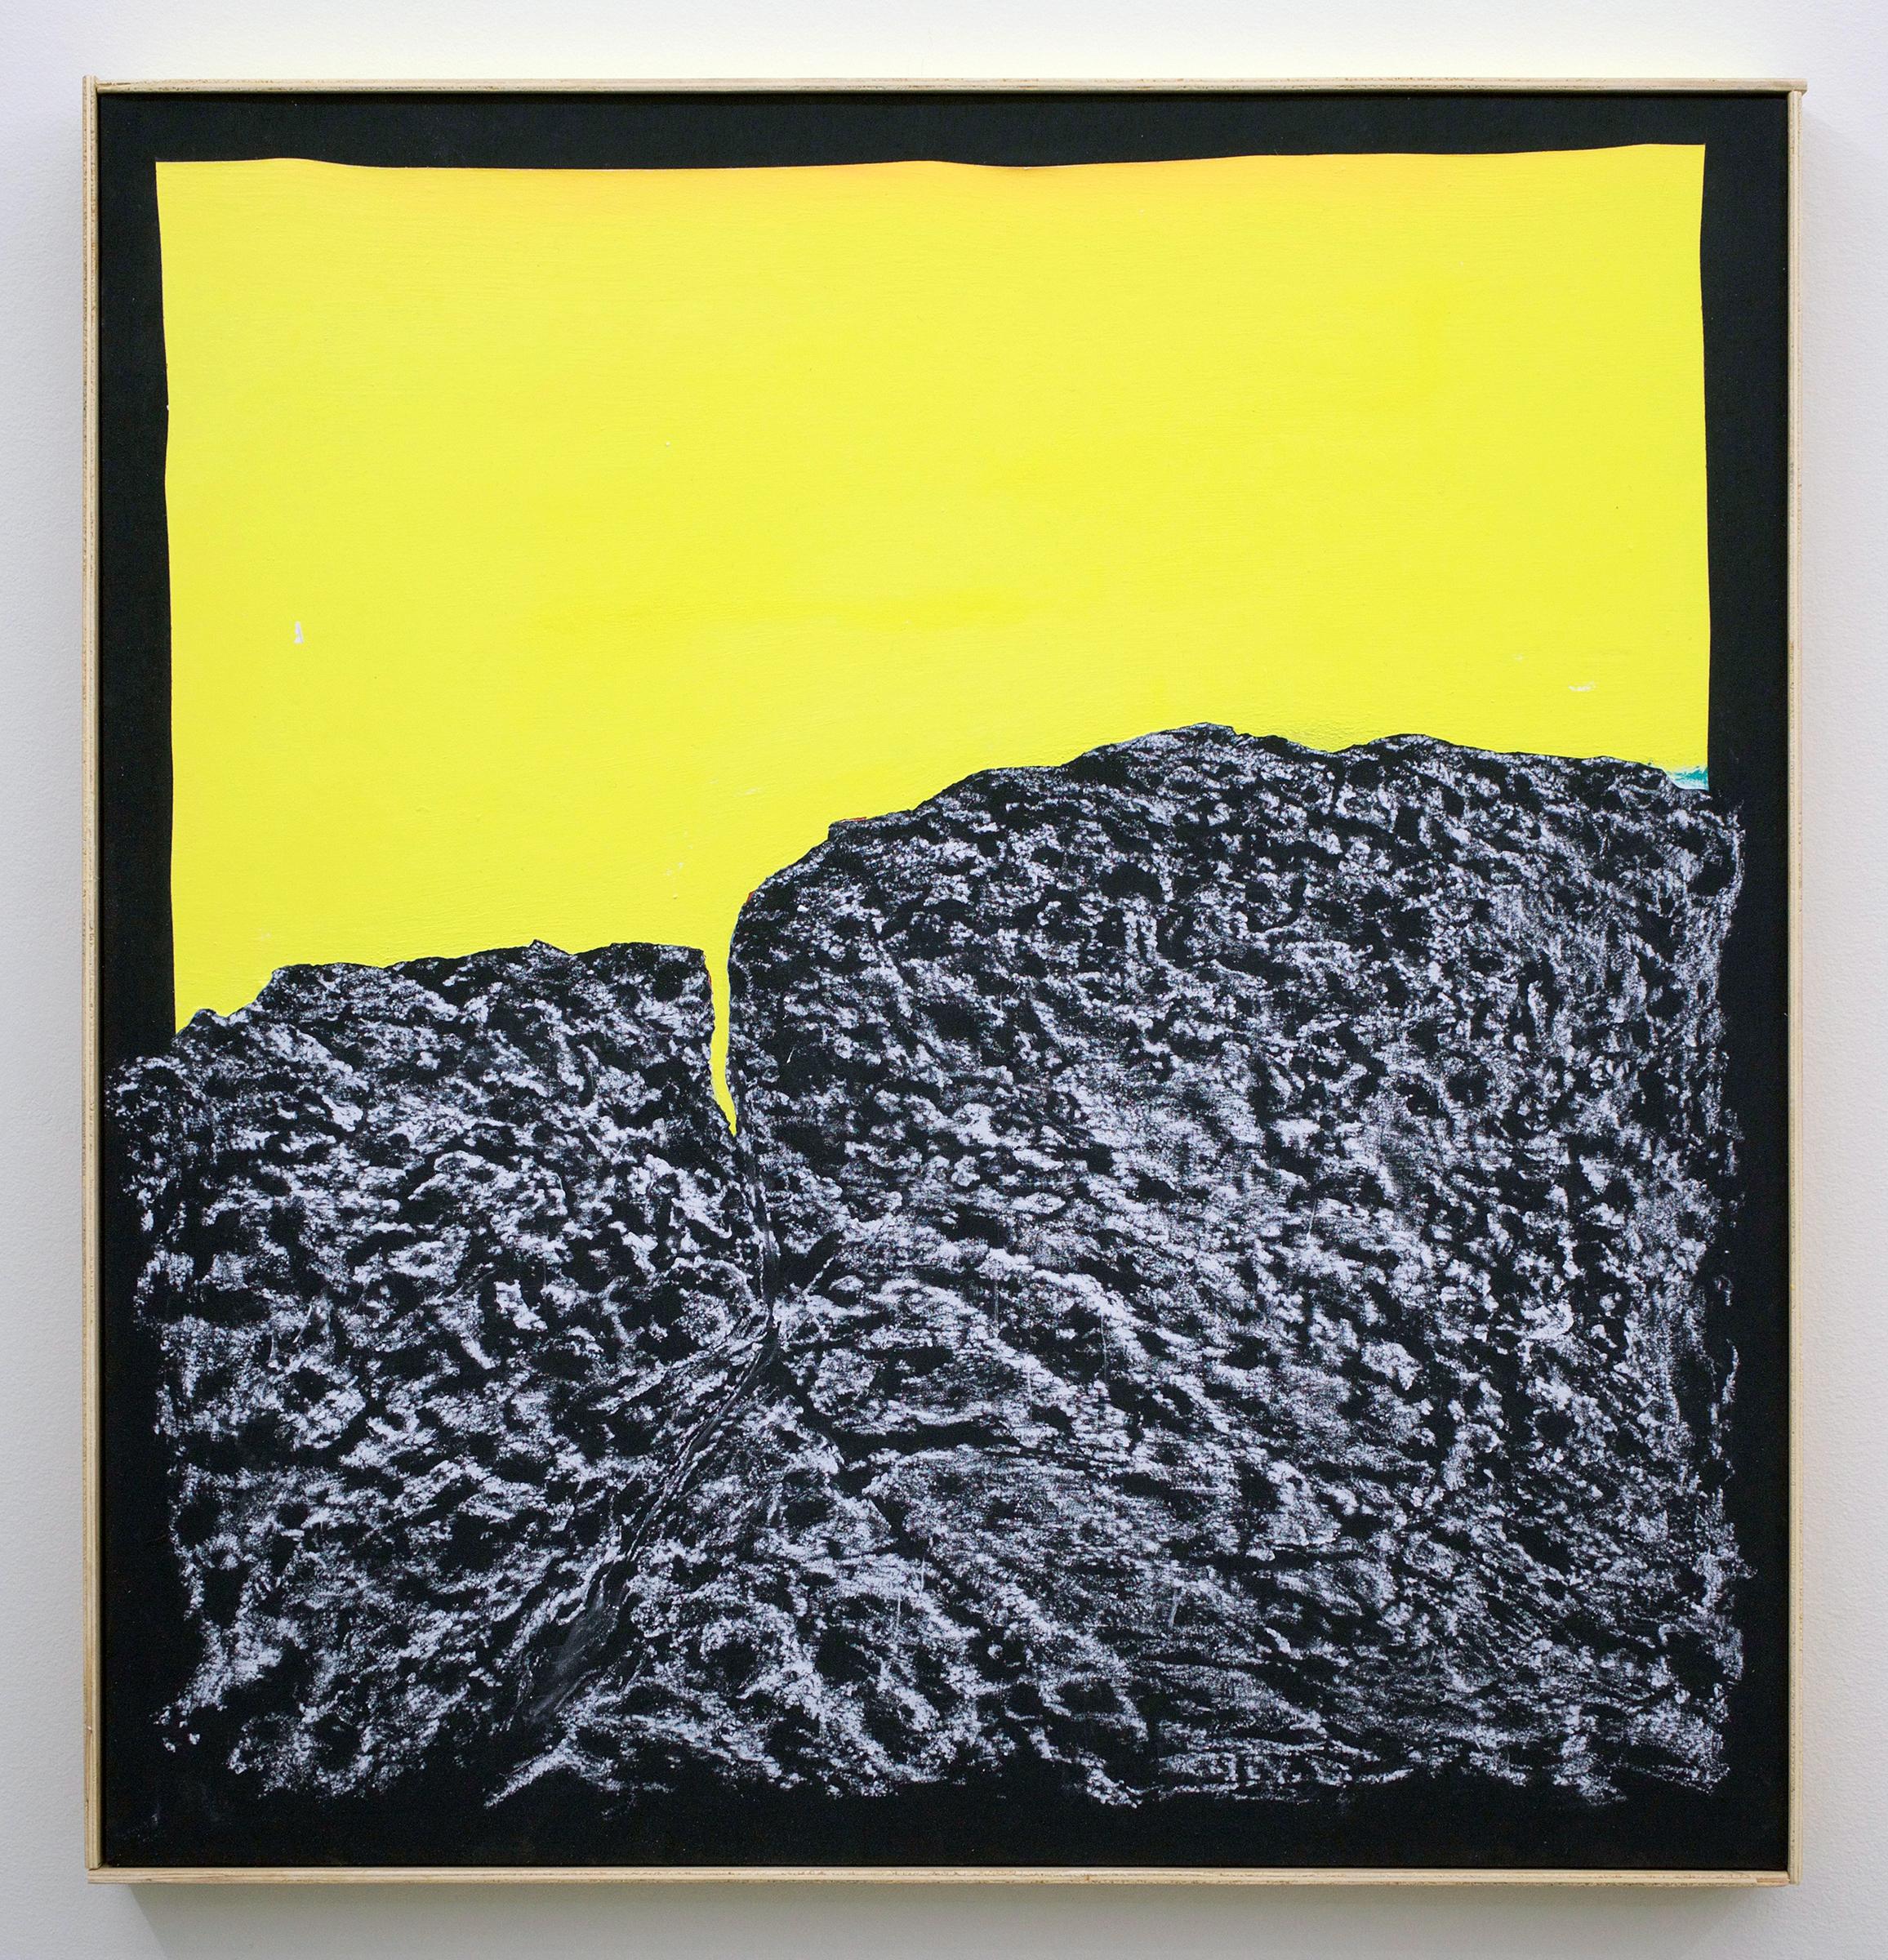 "CHRIS DUNCAN   Midday – Angles Landing, Zion Canyon Utah, April 4, 2017 , 2017, acrylic and crayon on fabric, 27 1/2"" x 26 1/2"""